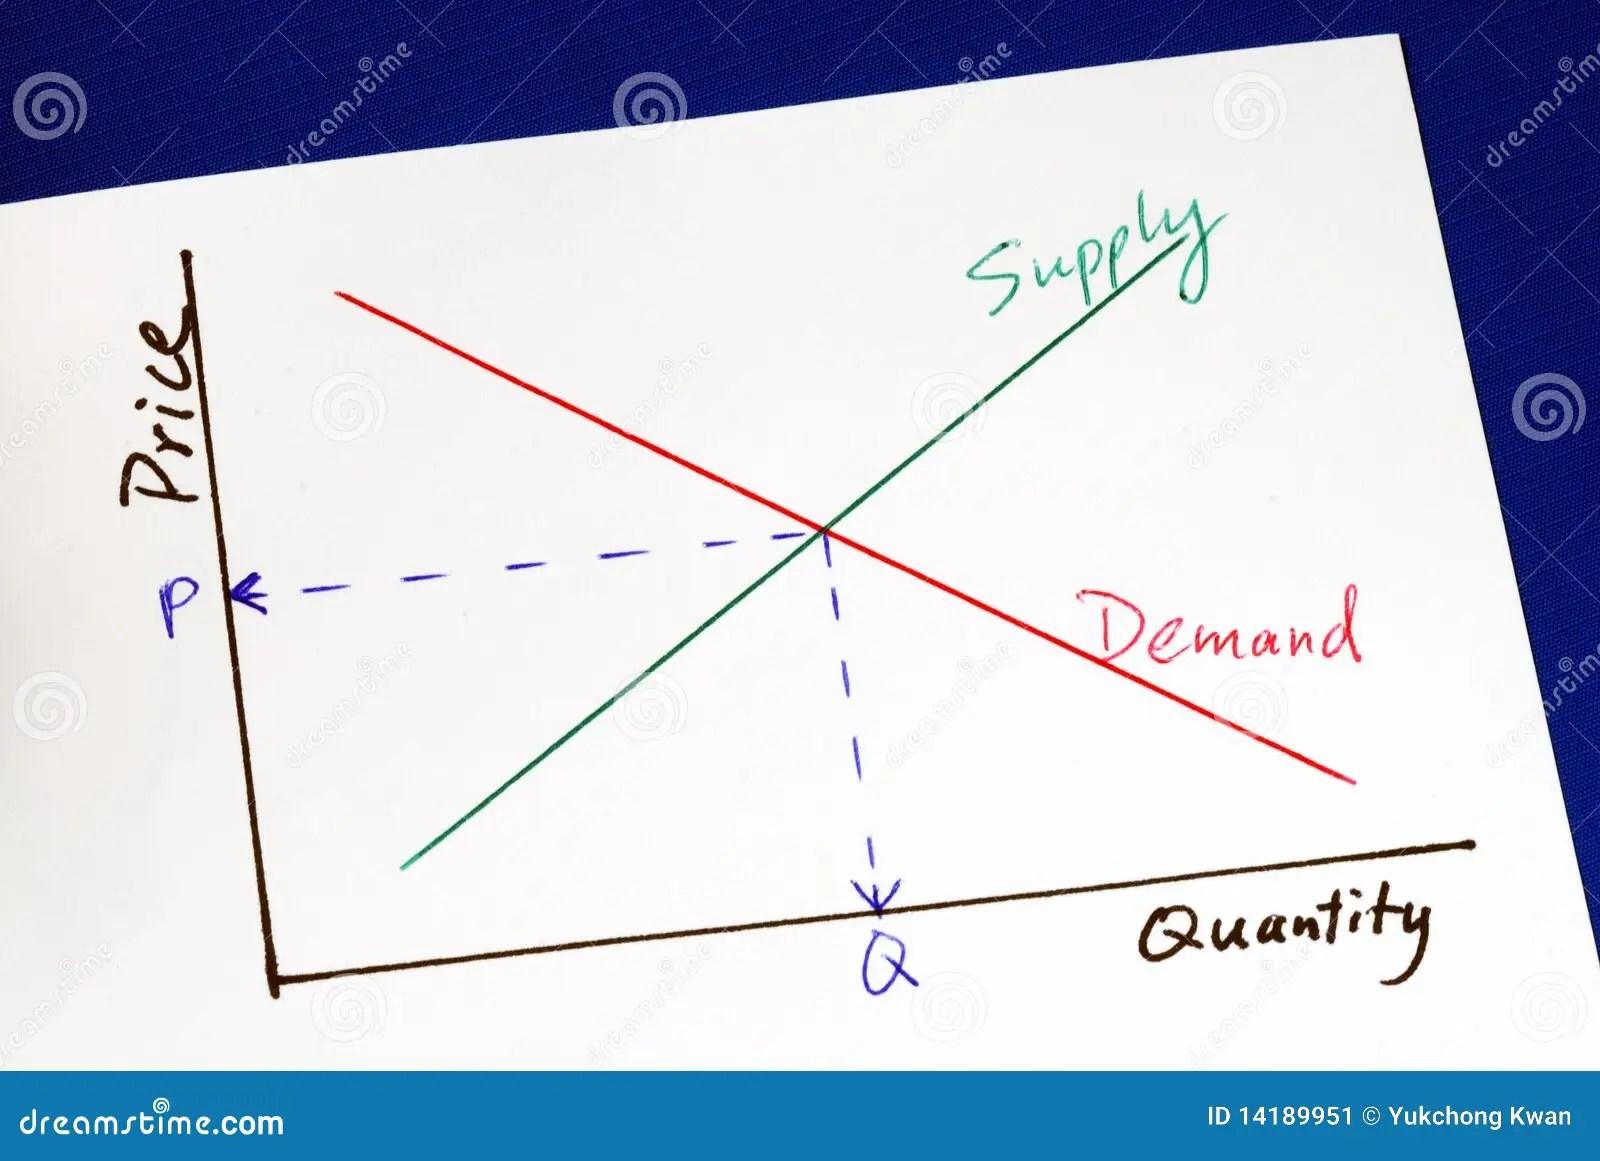 Supply And Demand Curves Stock Illustration Illustration